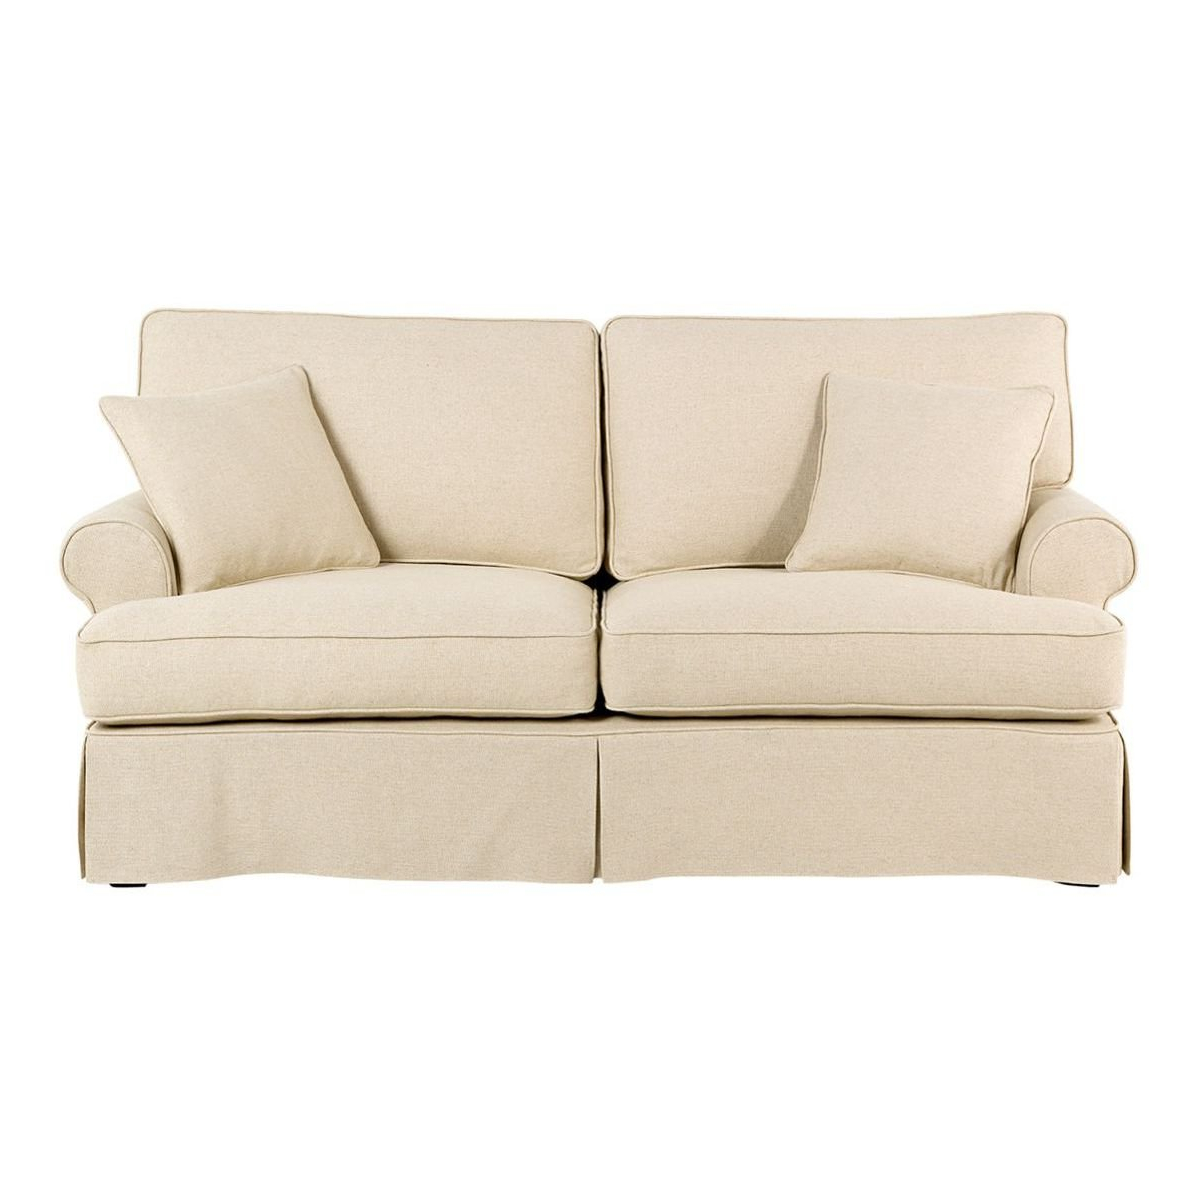 Sofas Relax El Corte Ingles E6d5 sofà 2 Plazas El Corte Inglà S Imà Genes Y Fotos